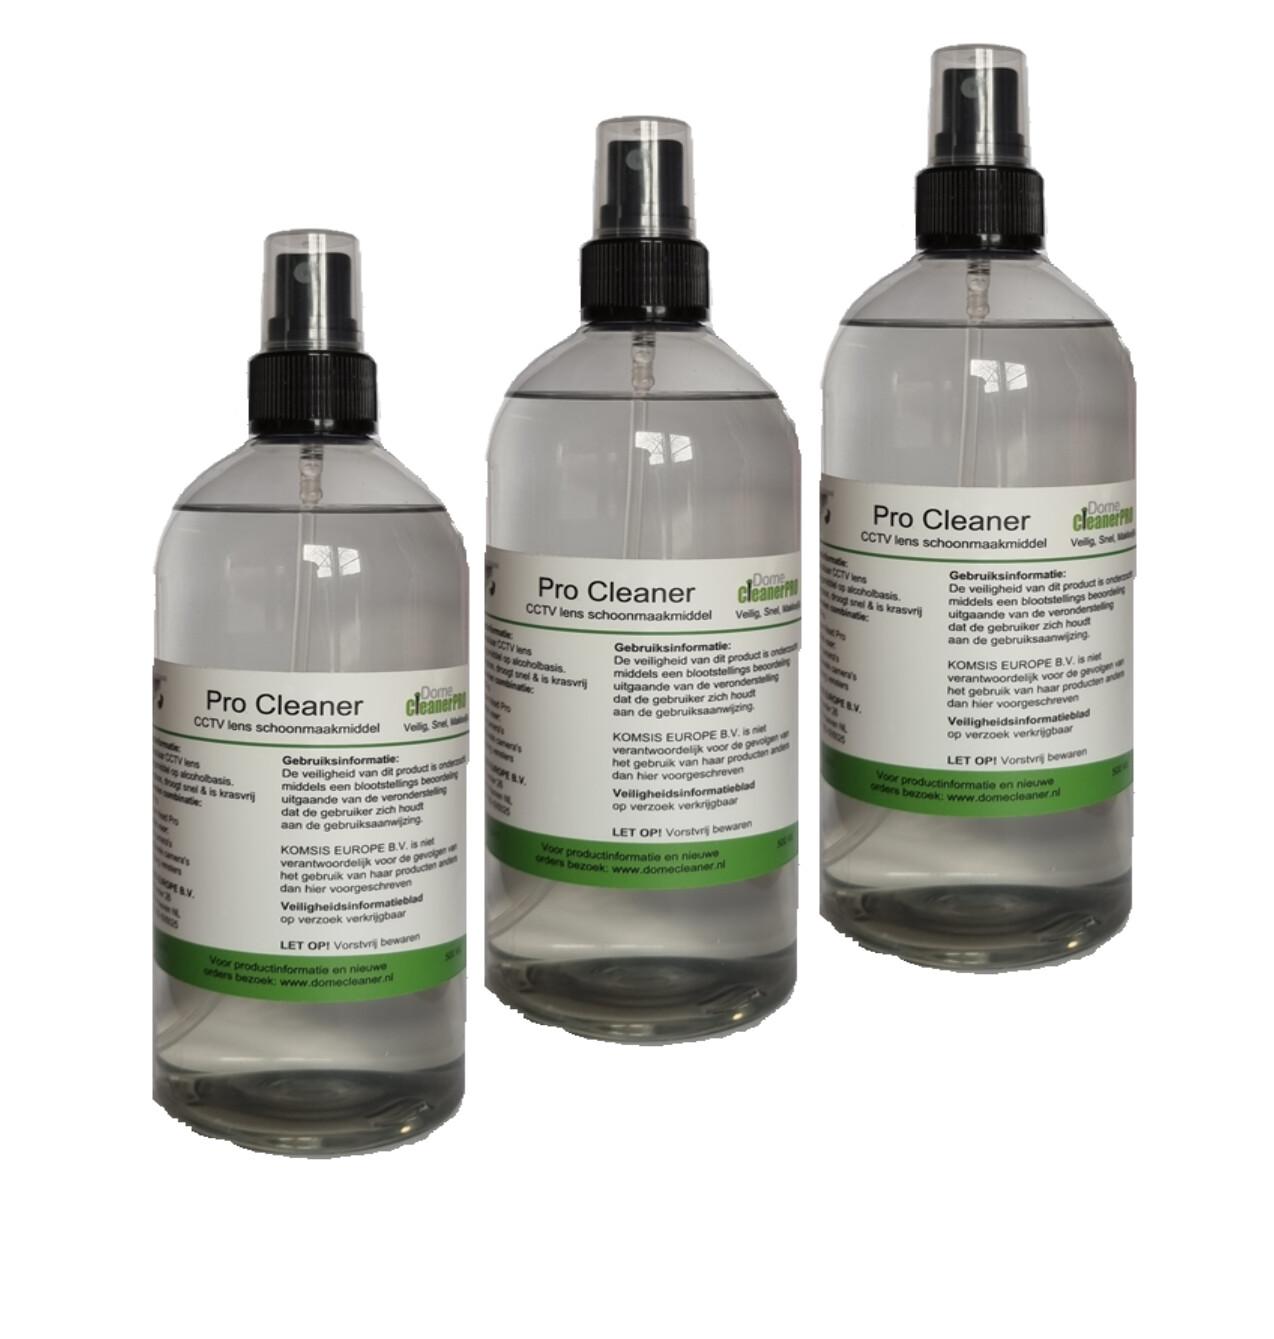 Pro Cleaner Schoonmaak middel 3 pack 500ML